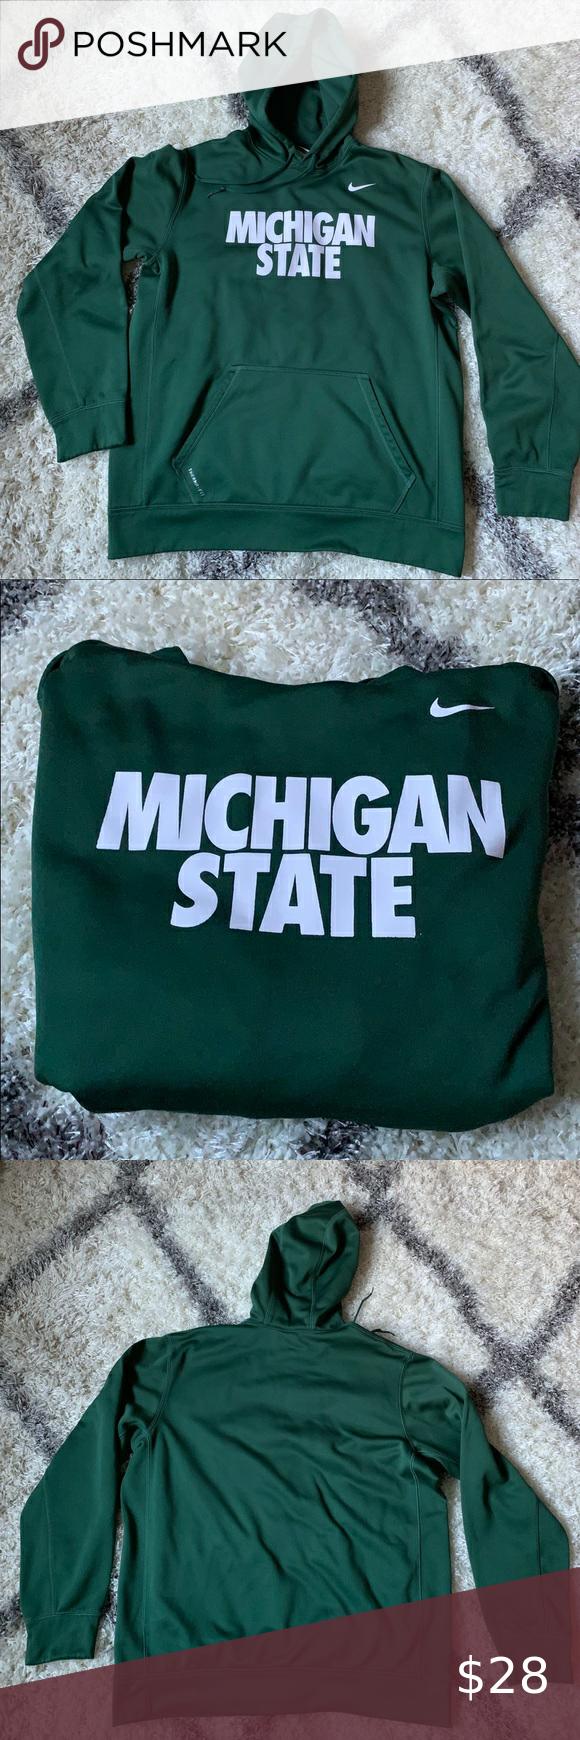 Men S Nike Michigan State Therma Fit Hoodie Workout Hoodie Hoodies State Hoodie [ 1740 x 580 Pixel ]